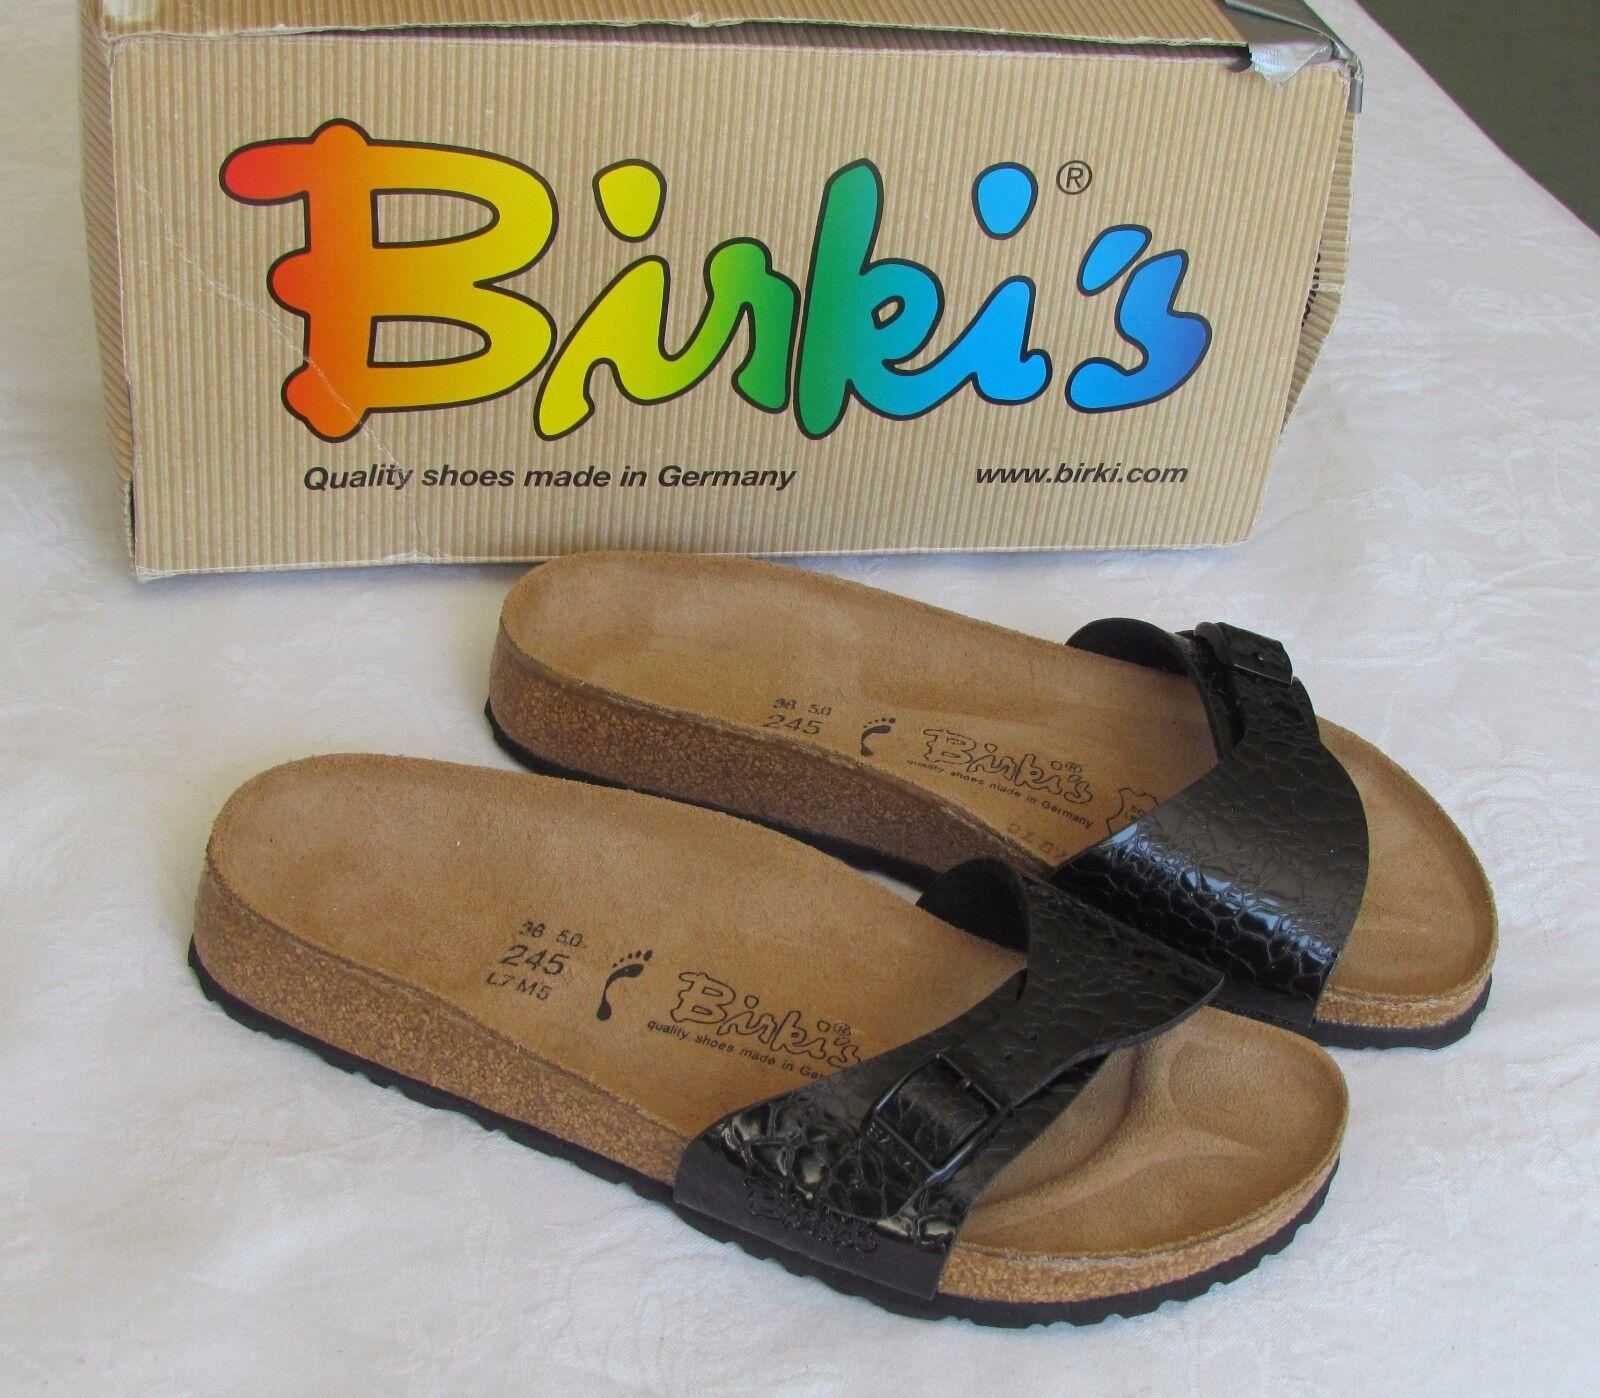 Último gran descuento NEW Birkis By Birkenstock Ladies Black Patent Croc Print Mules Sandals Size 5 38